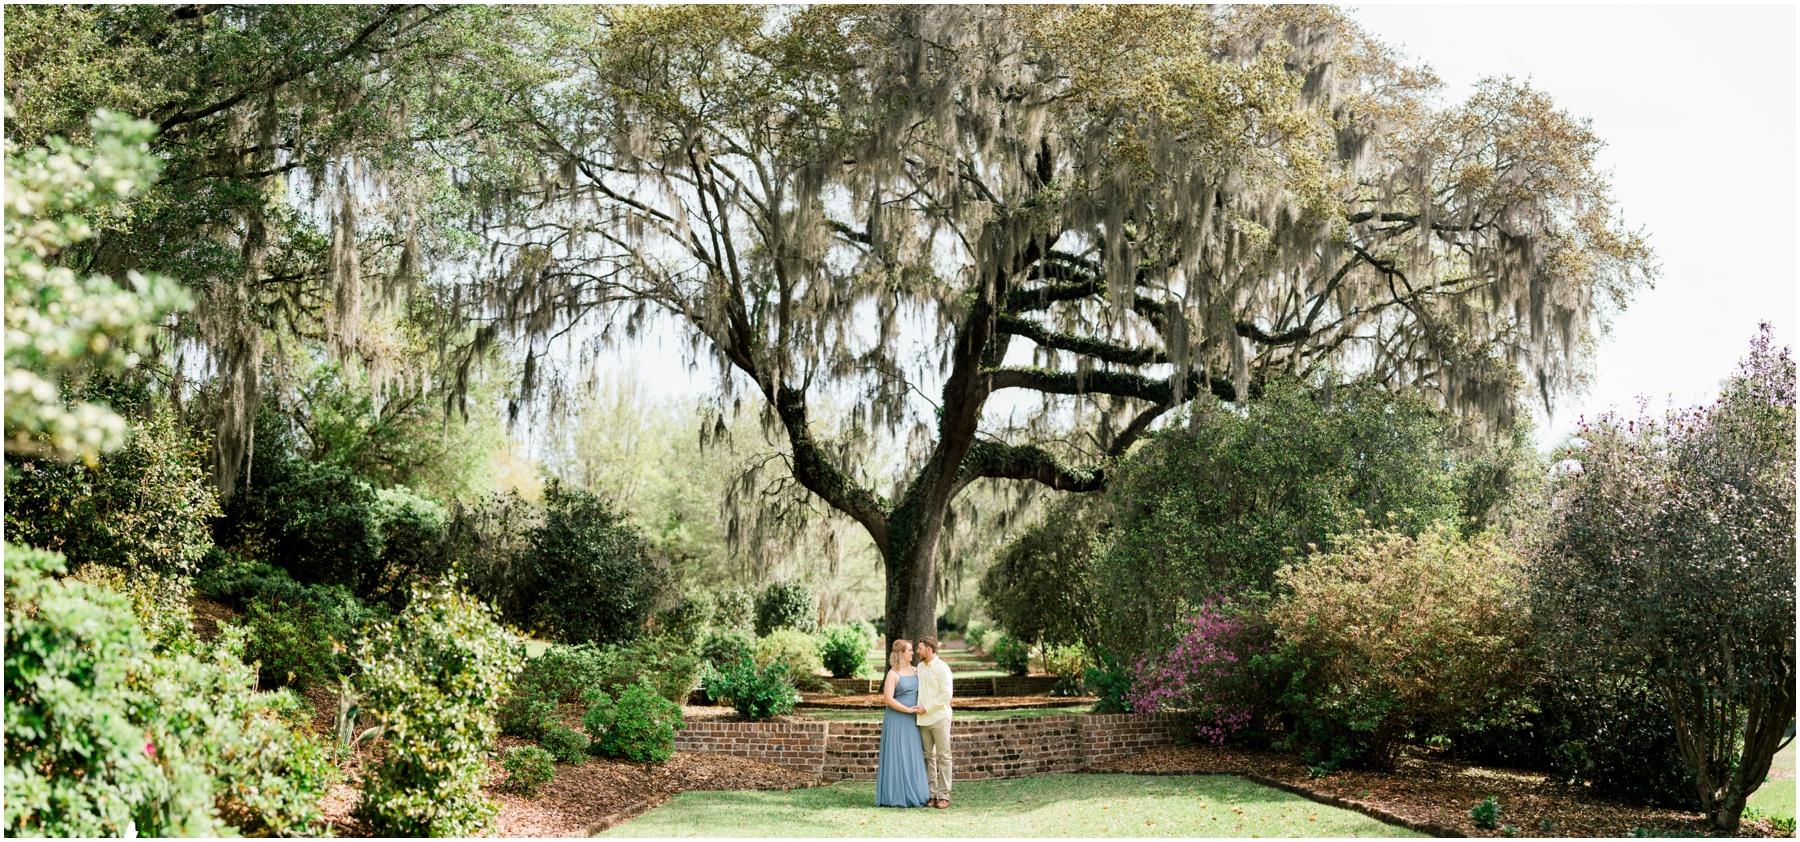 Mepkin-Abbey-Moncks-Corner-South-Carolina-Engagement-Session-Photos_0001.jpg